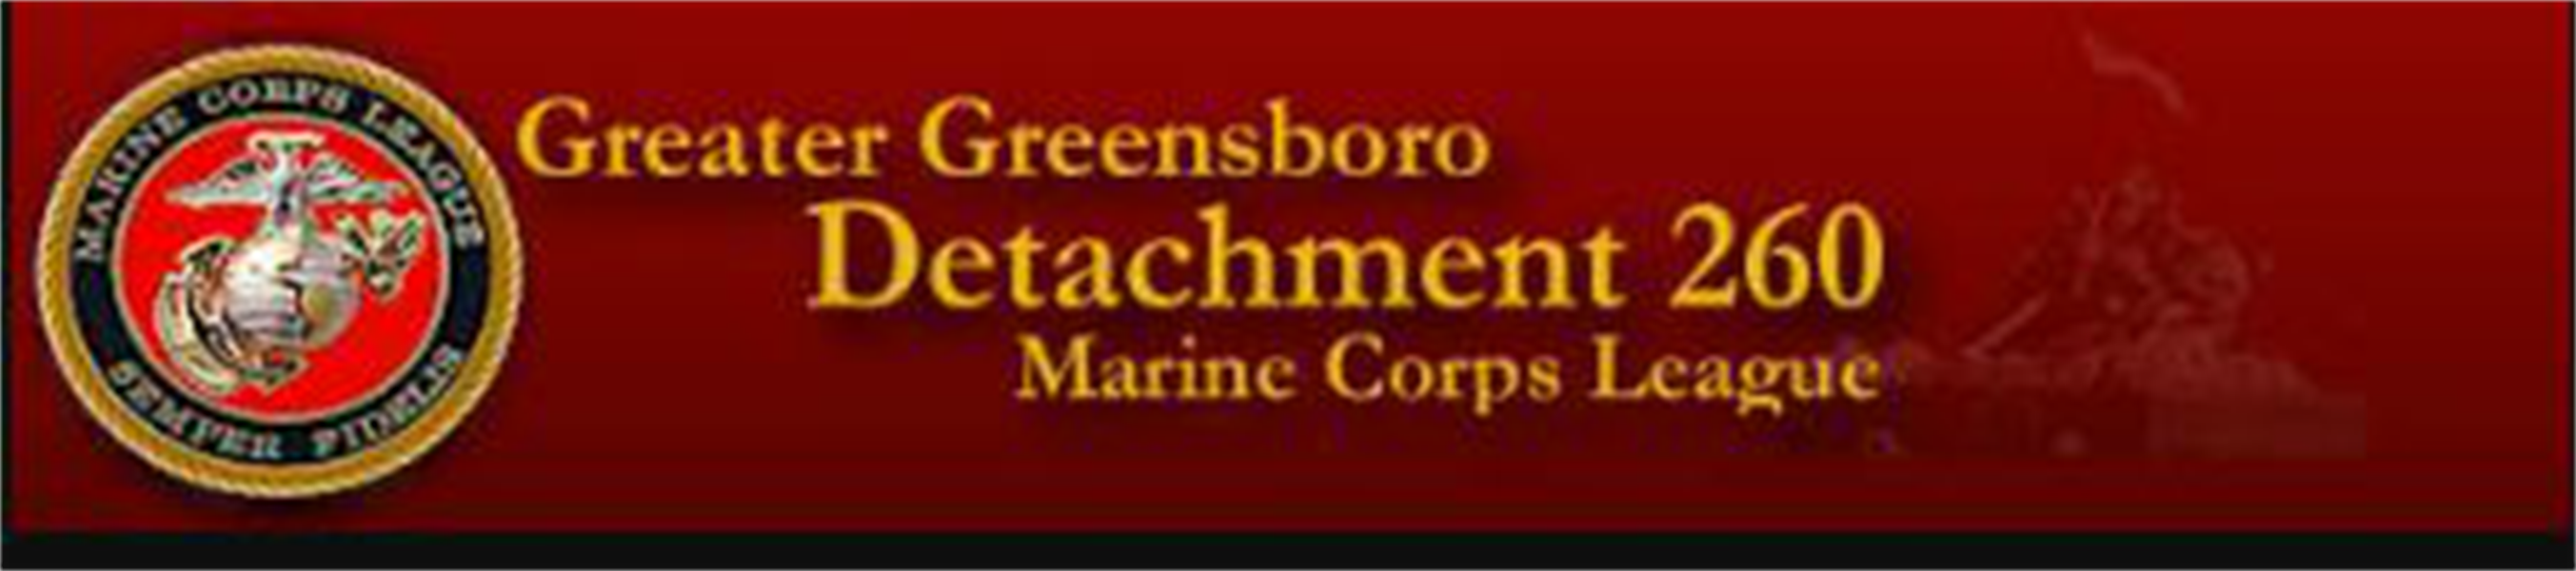 Greater Greensboro Detachment 260 Marine Corps League